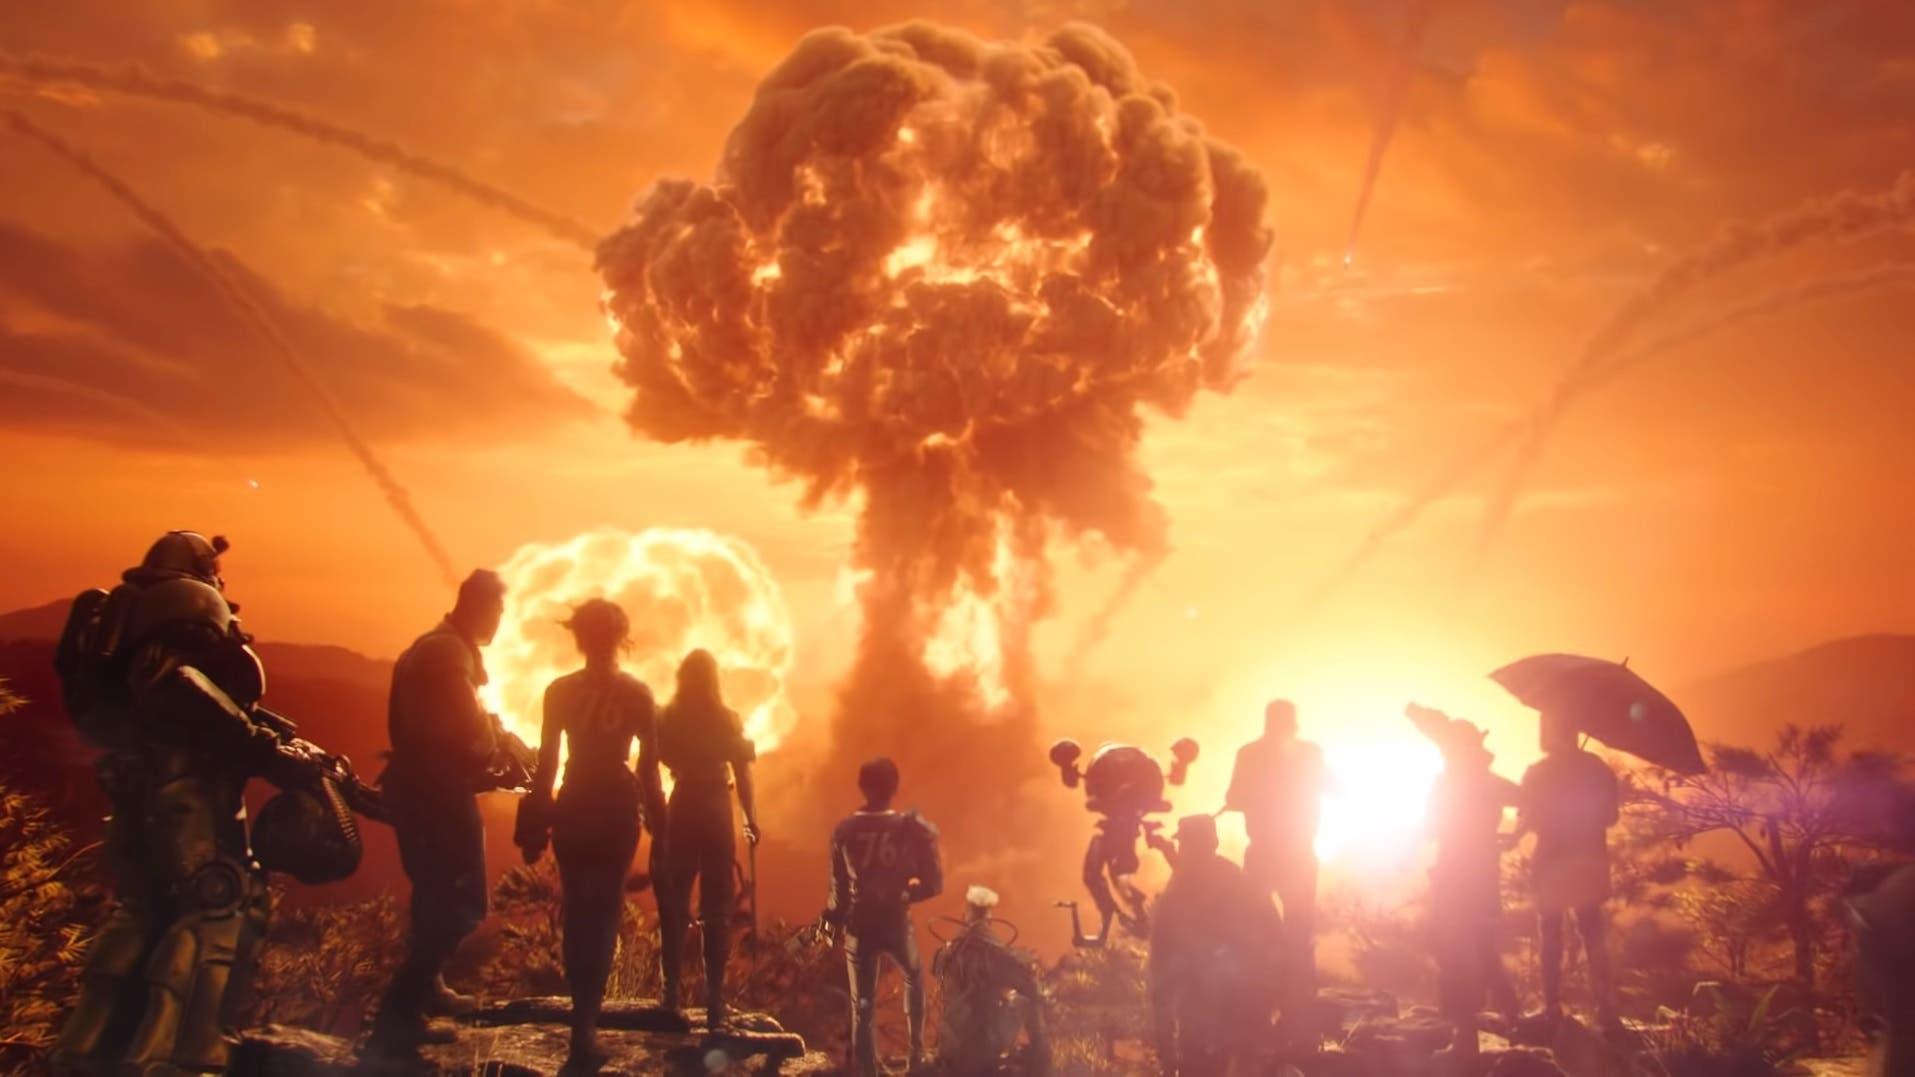 Imagen de La comunidad de Fallout 76 rinde un especial homenaje a Kobe Bryant